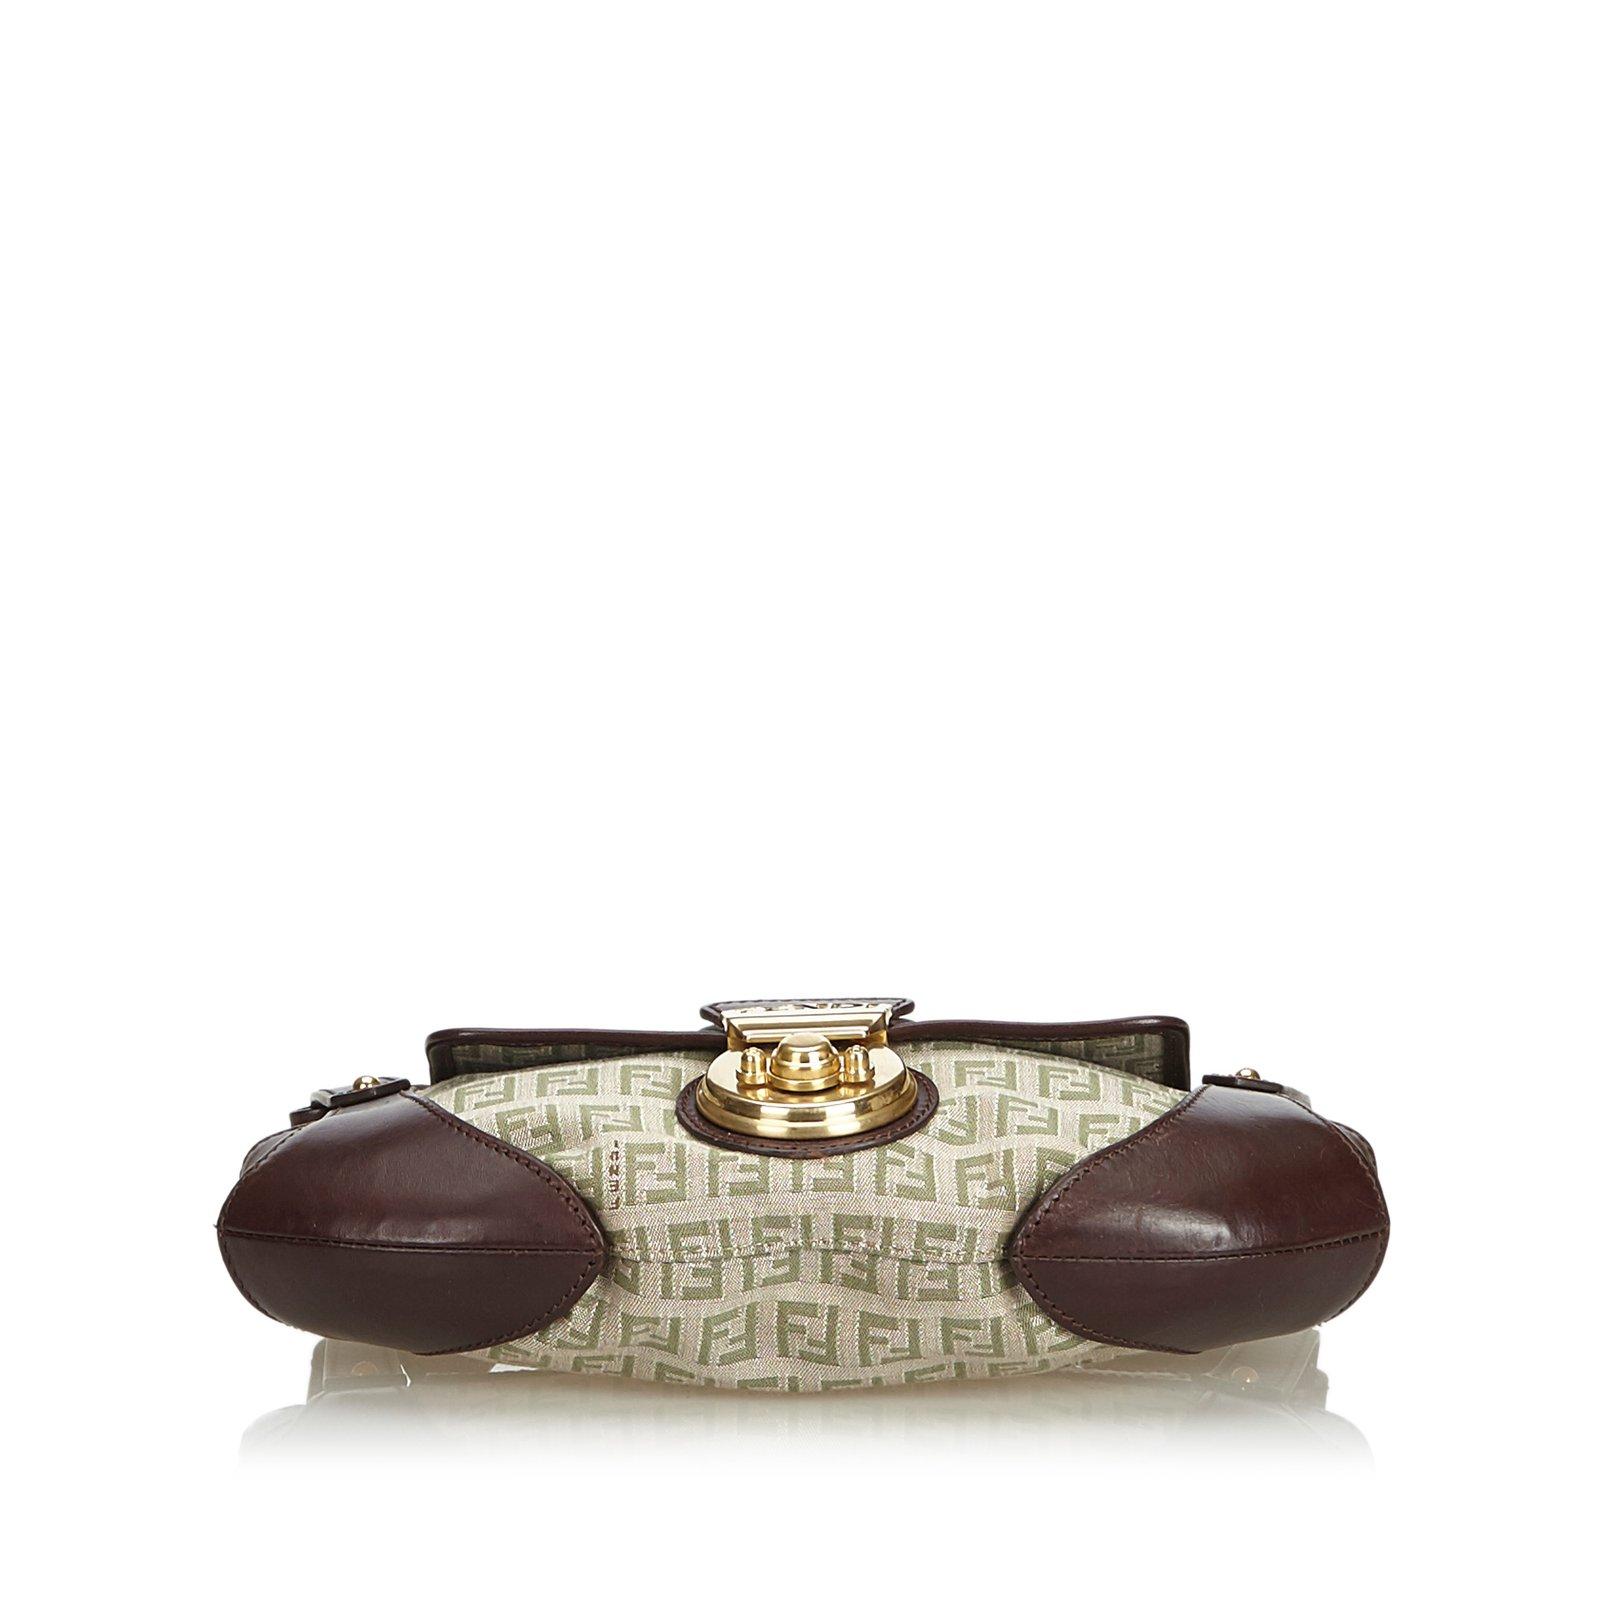 3bdaef99d330 Fendi Jacquard Zucchino Compilation Bag Handbags Leather